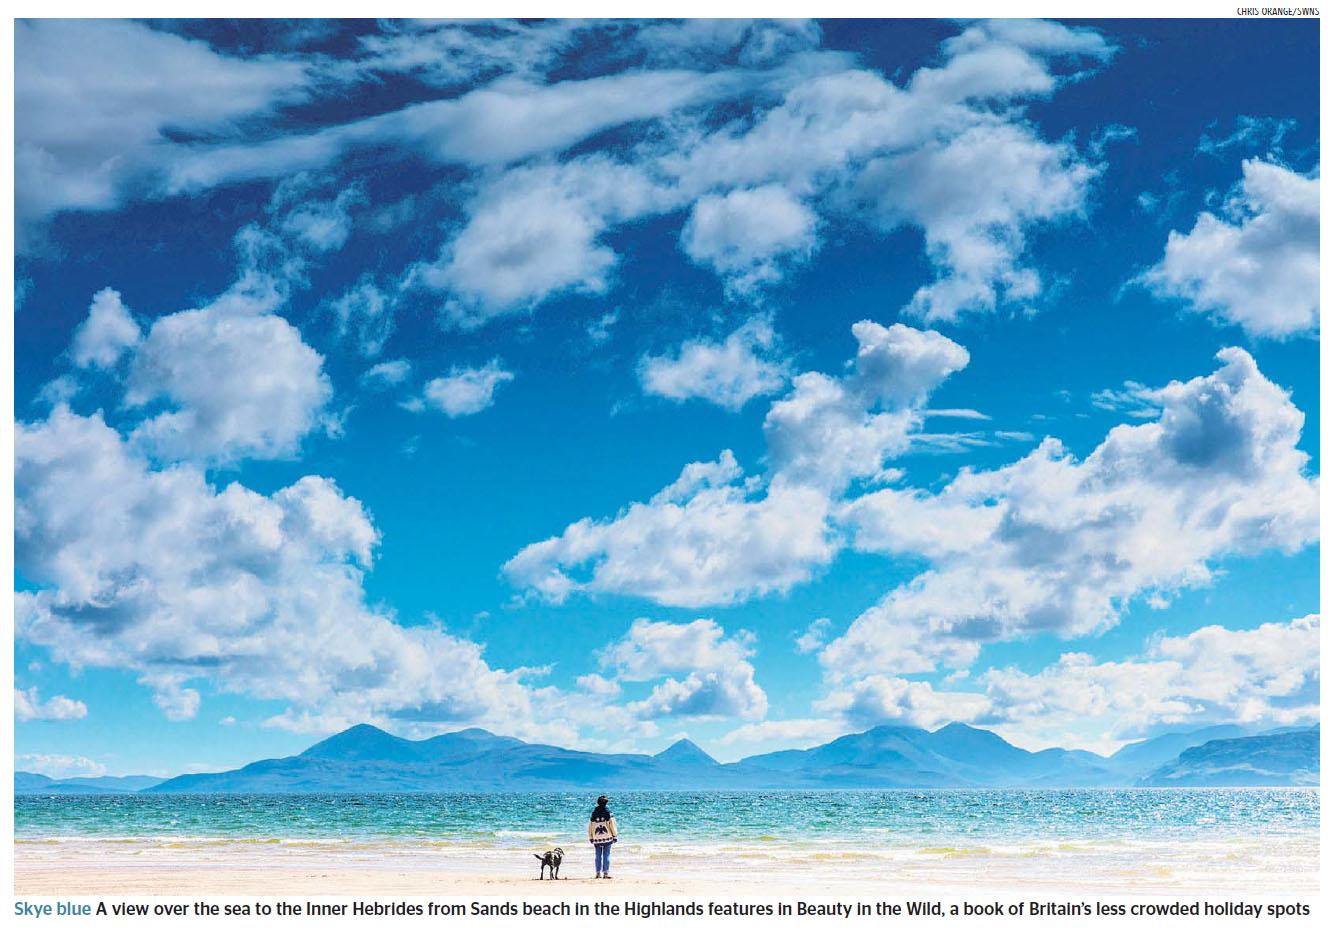 Inner Hebrides from Sands beach, Highlands by Chris Orange.jpg